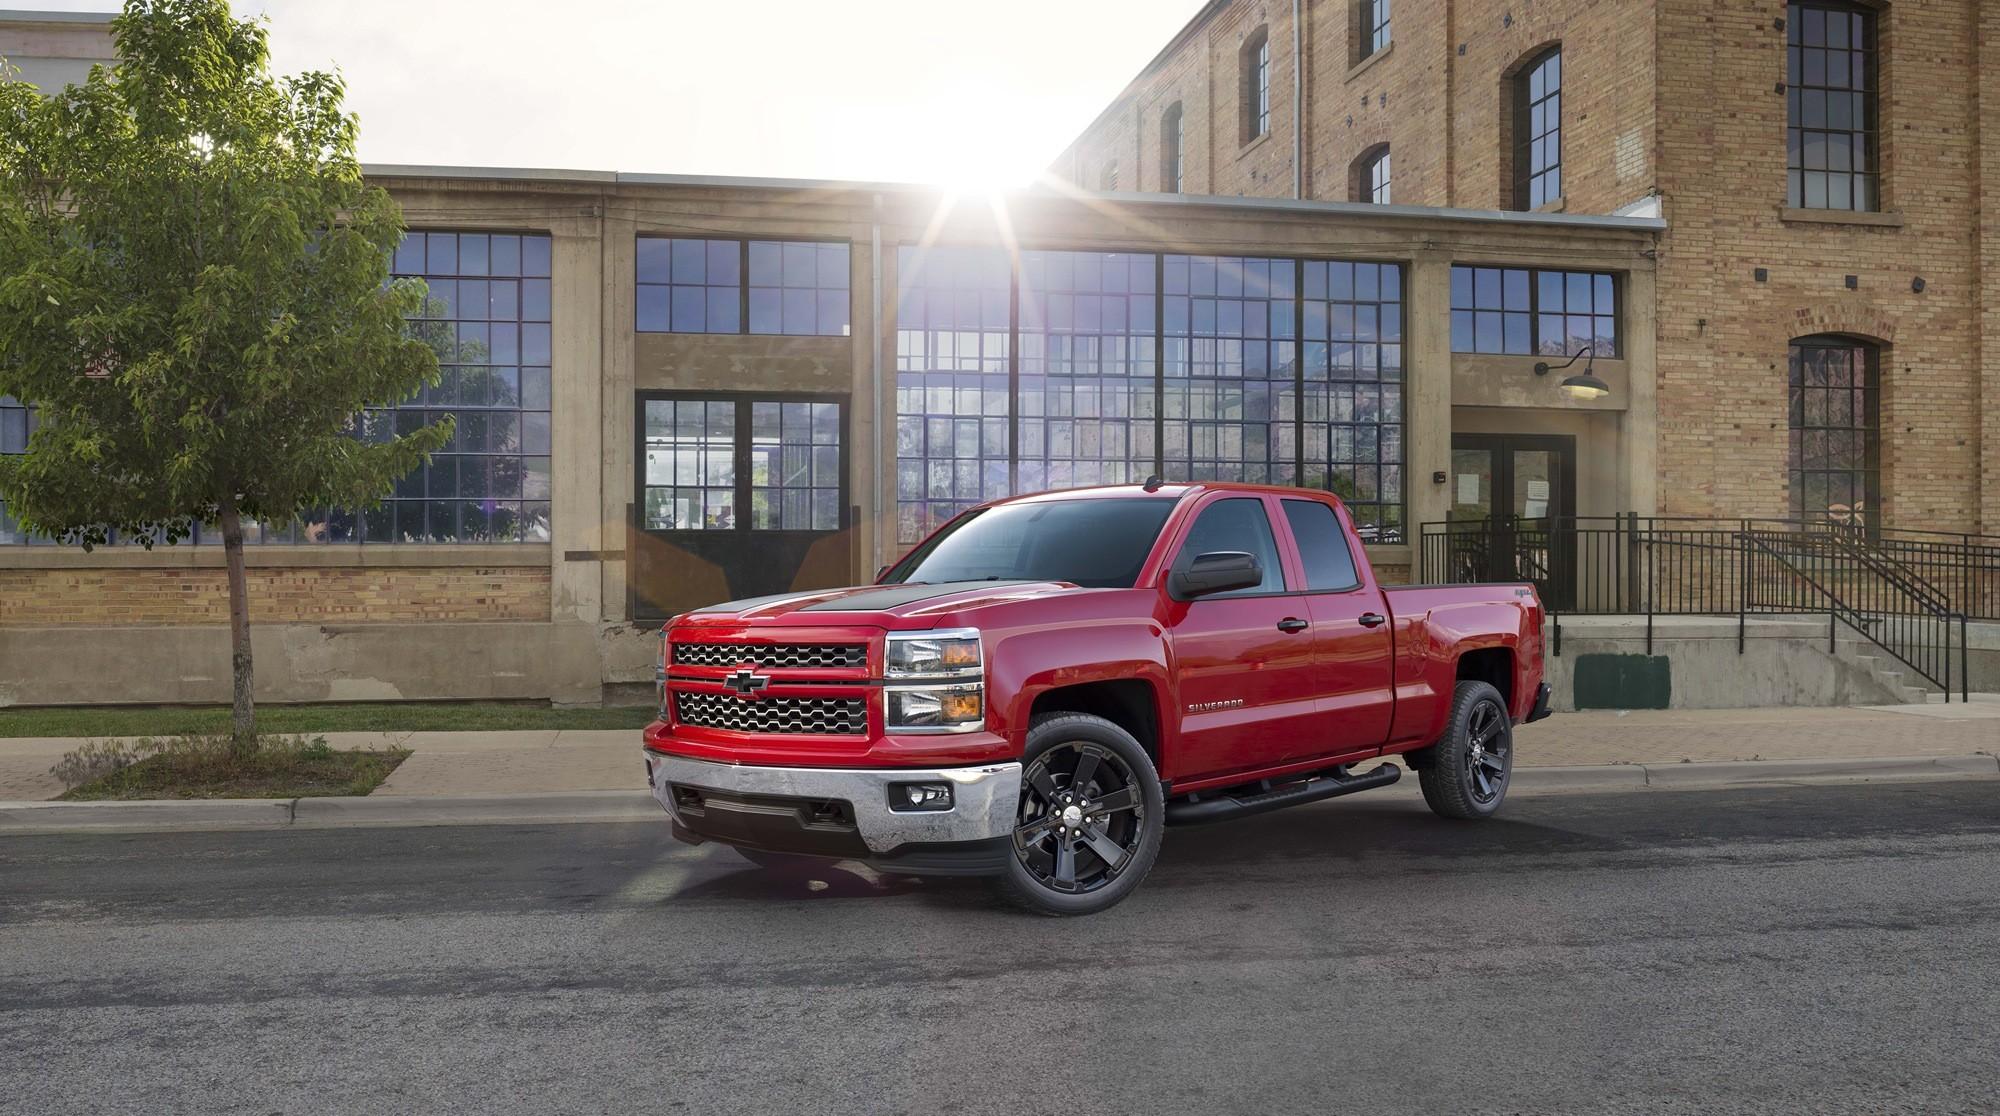 2015 Chevrolet Silverado HD Background Wallpapers